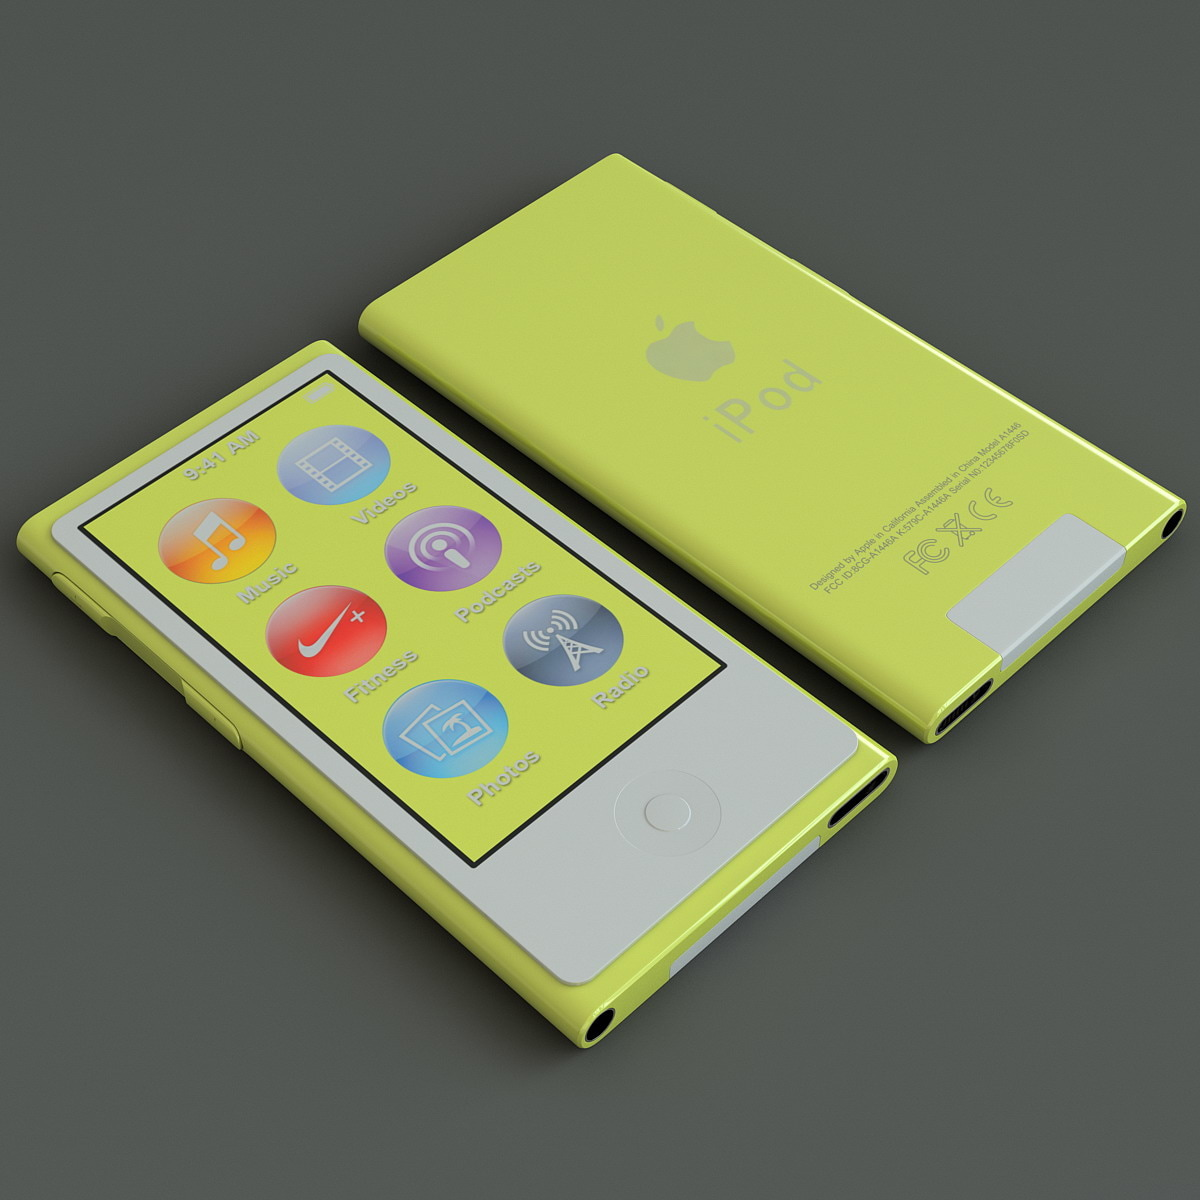 Ipod_Nano_Generation_7th_Yellow_004.jpg